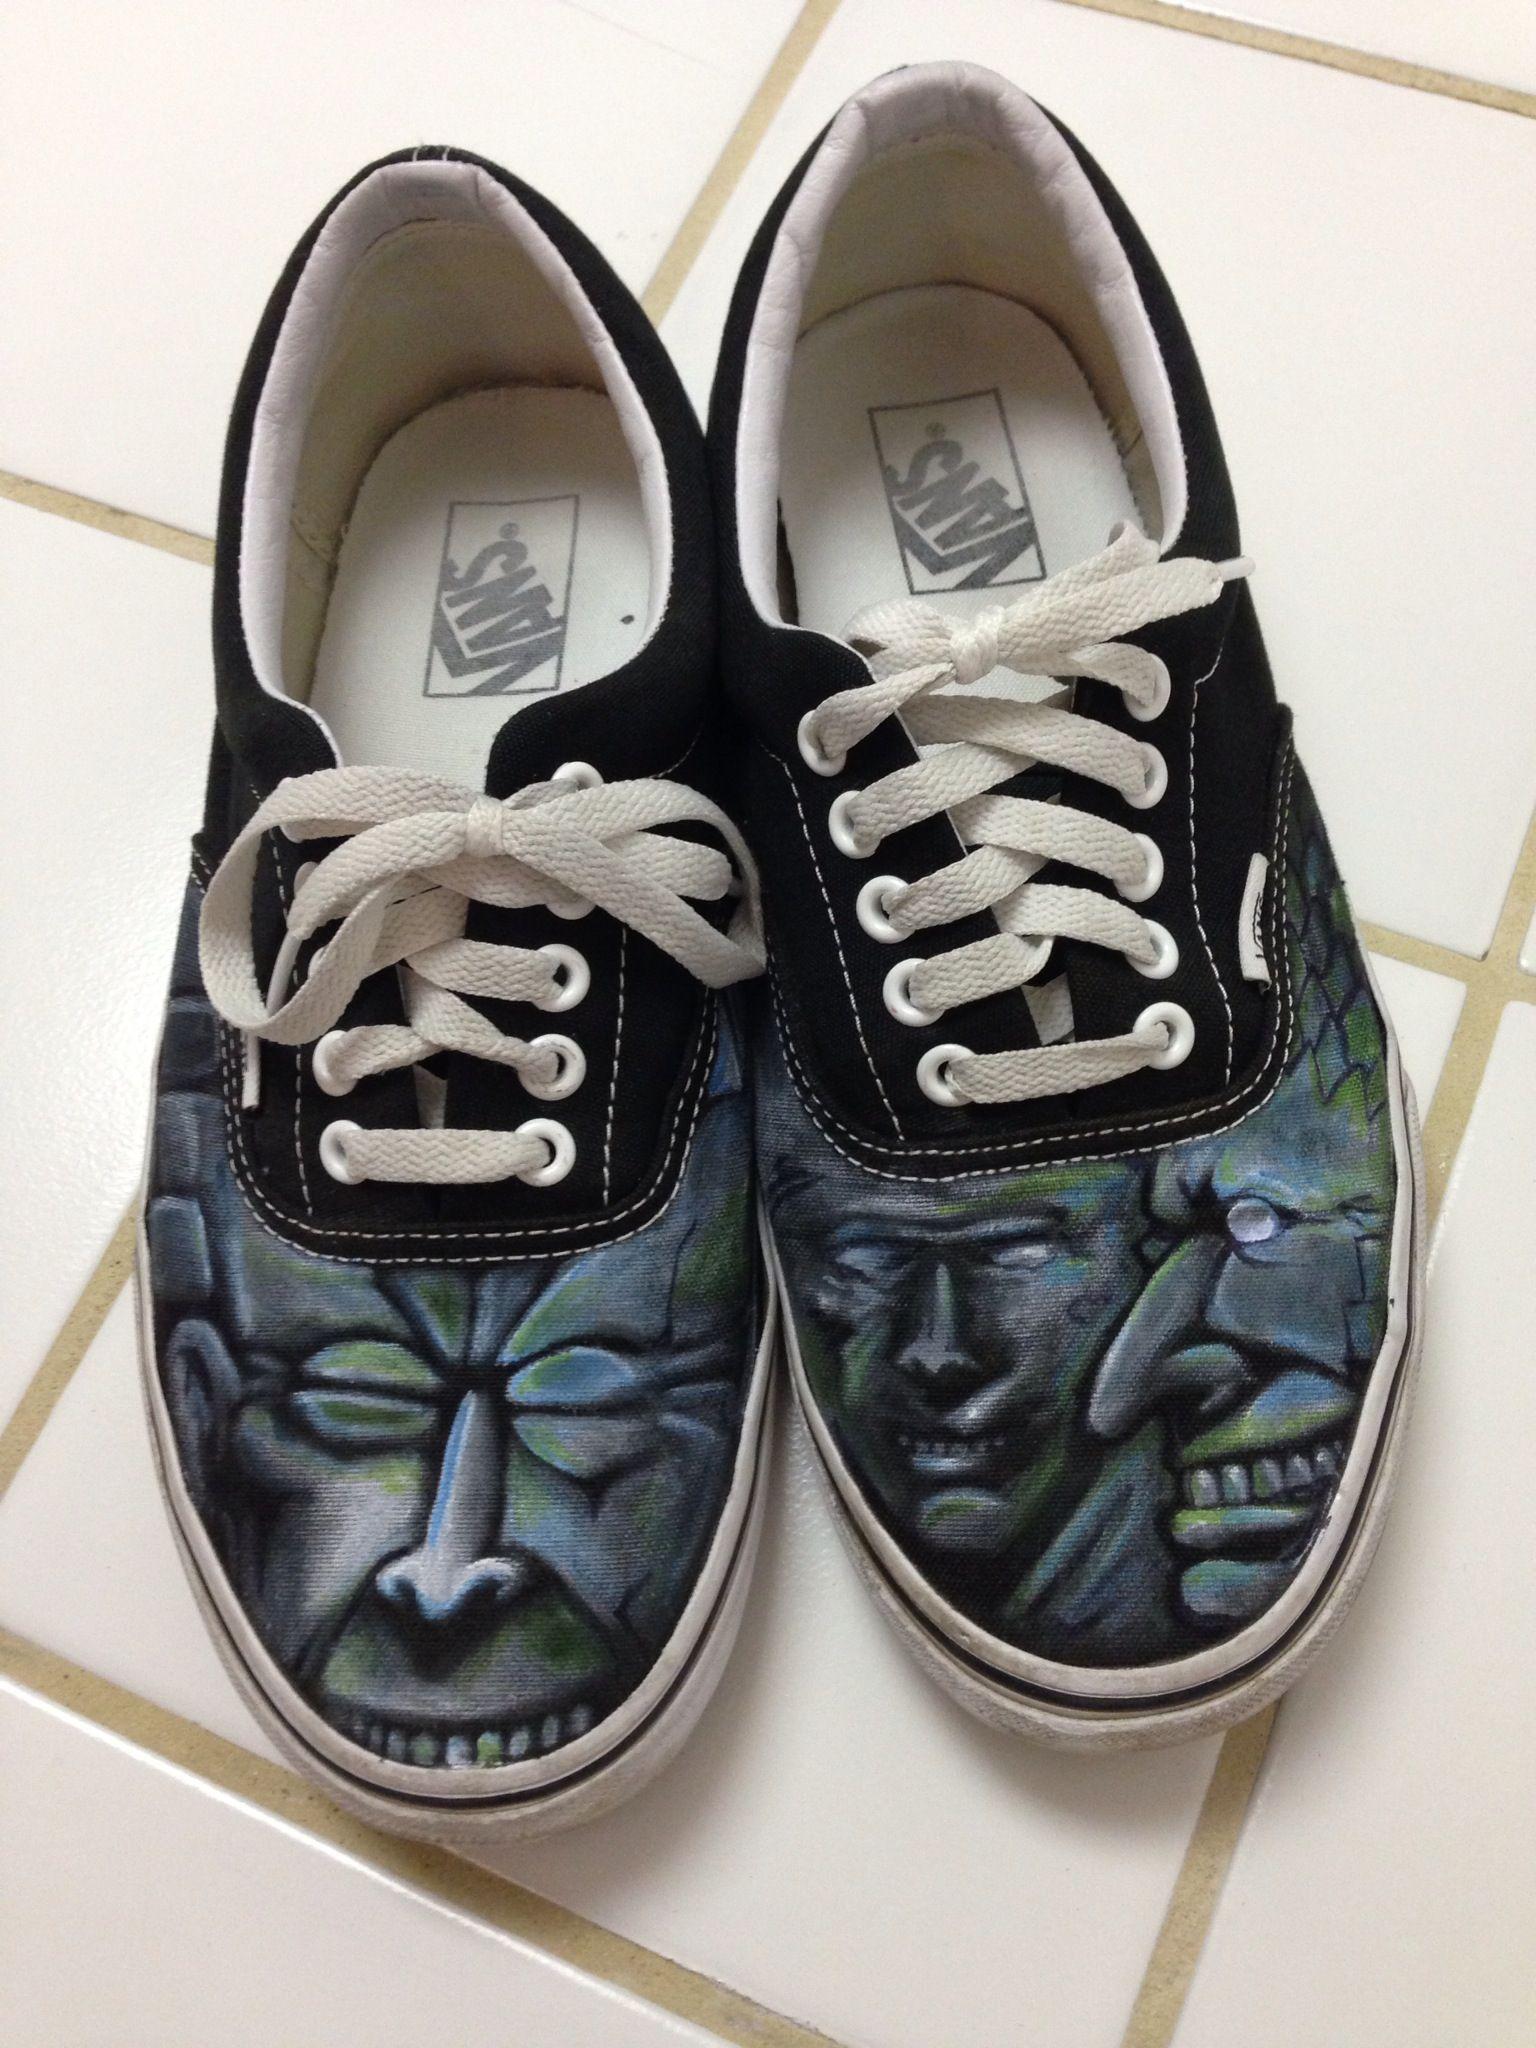 Vans Shoes art by Kelly Parra   Vans